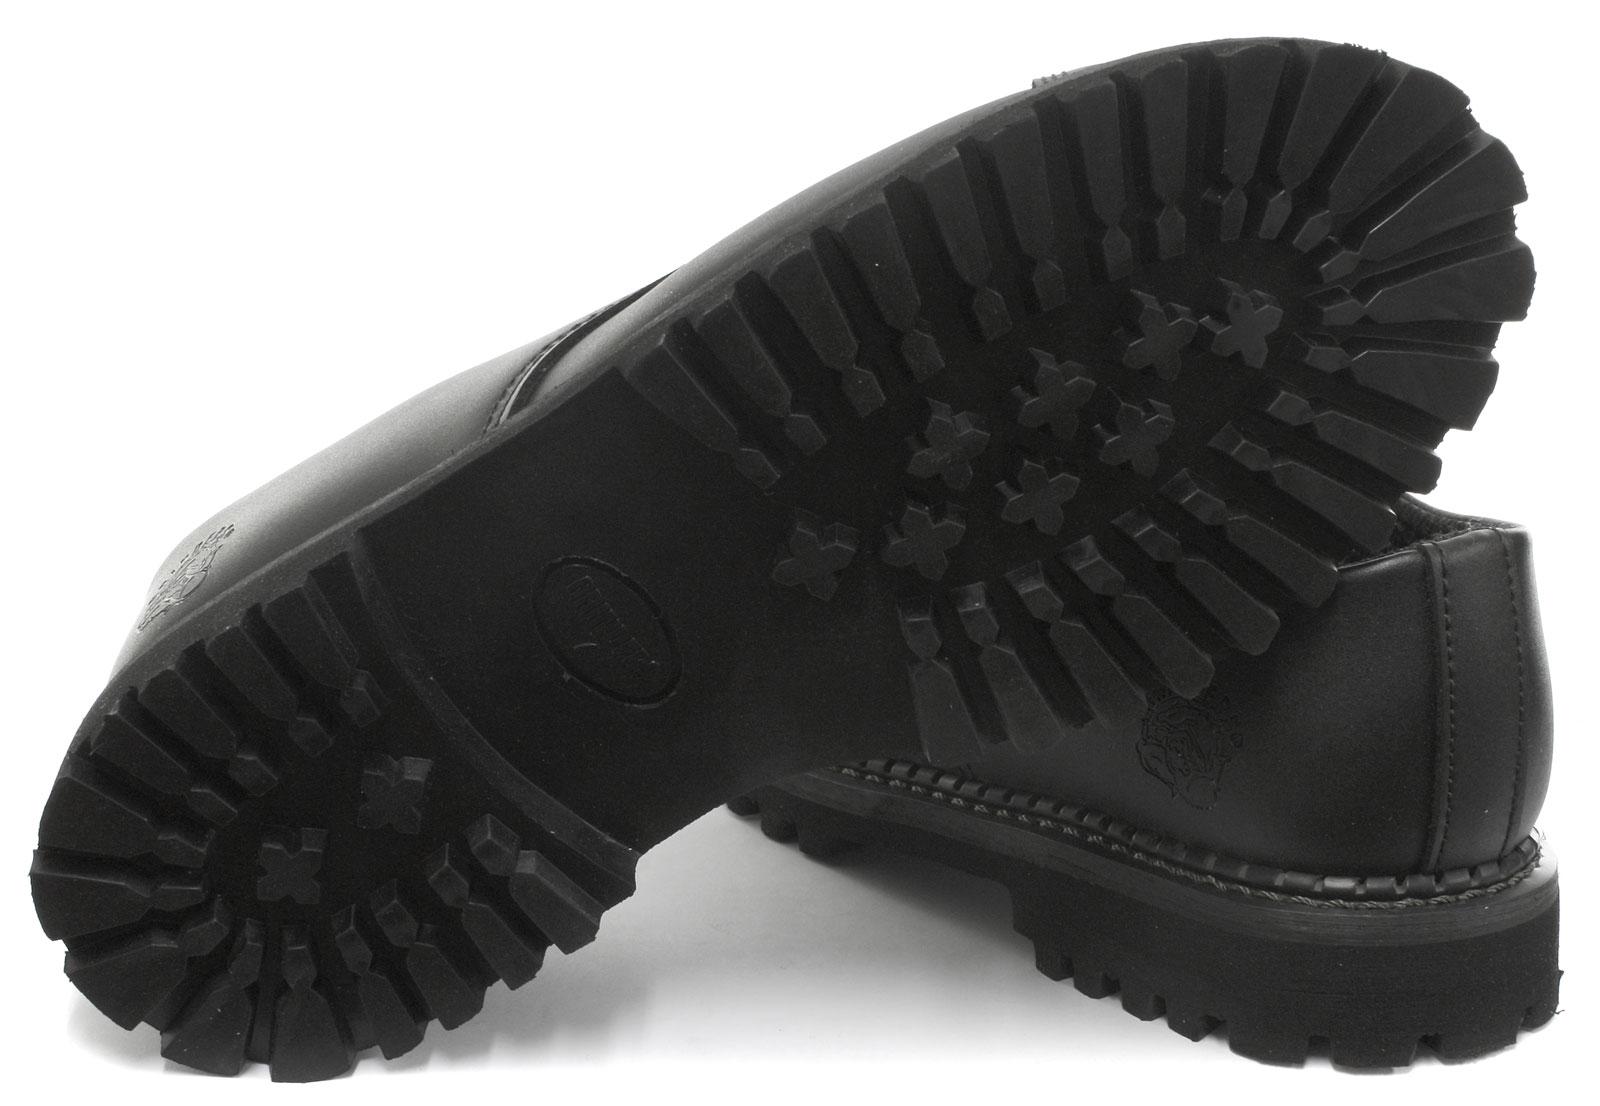 Neu Grinders Regent 2015 Schwarz Schuhe  Uomo Sicherheits-Stahl-Zehenschutzkappe Schuhe Schwarz b7dea1